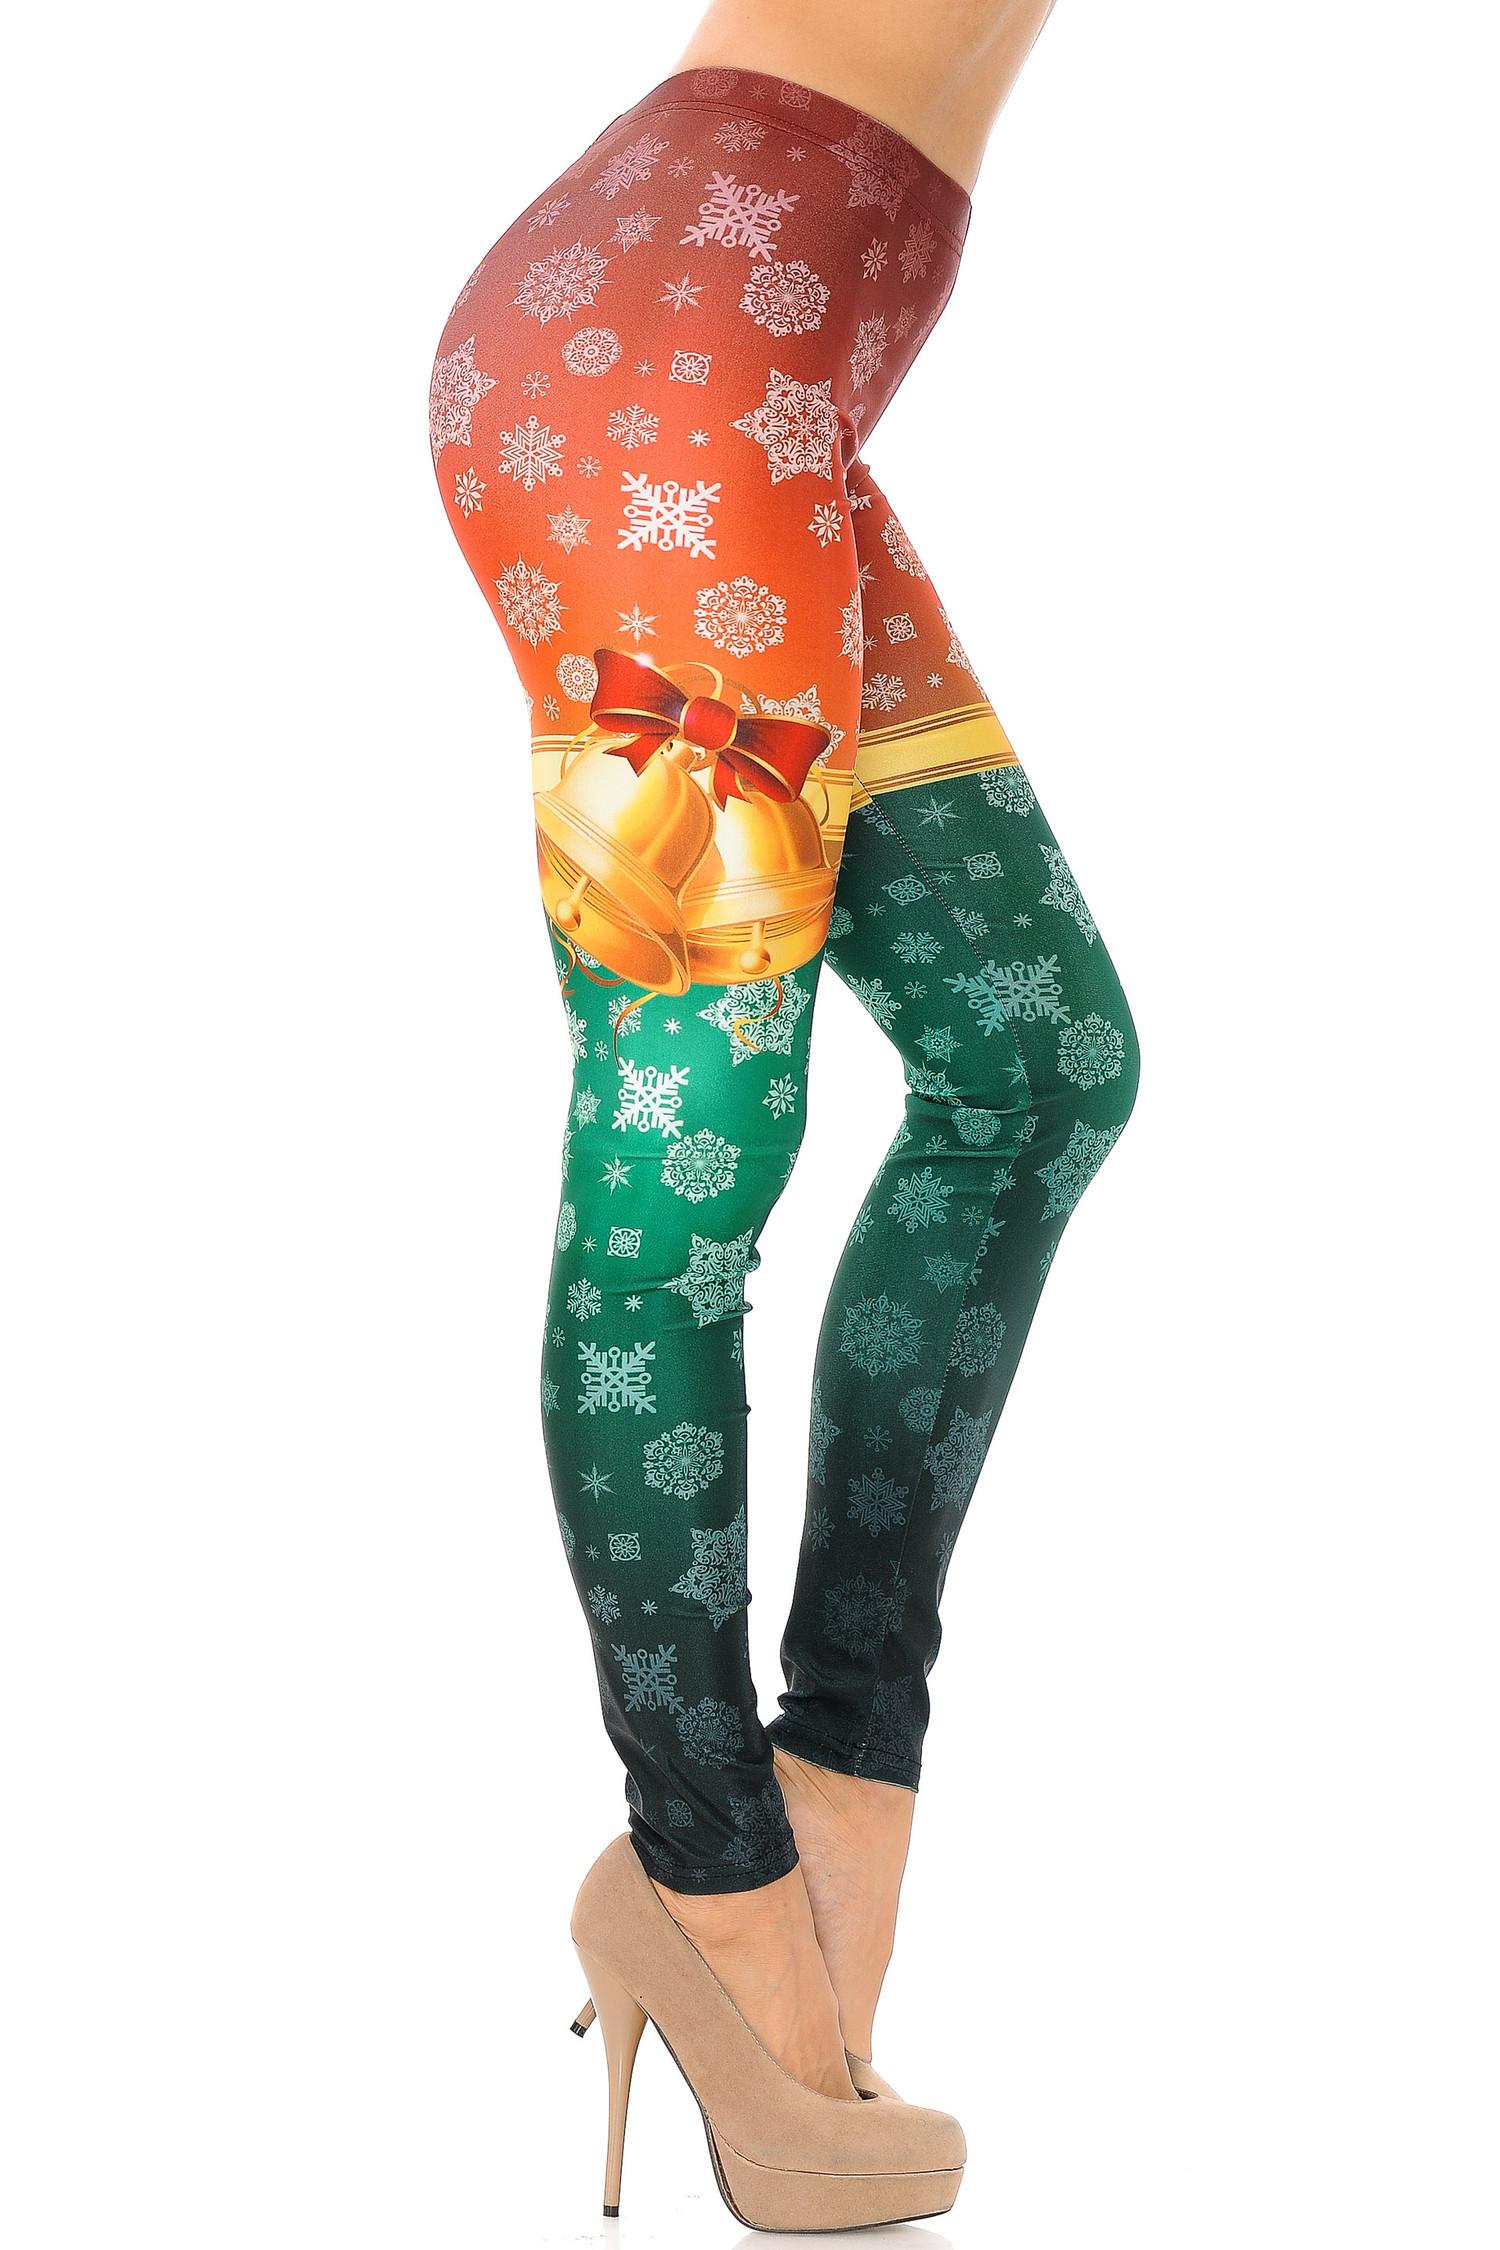 Festive Red and Green Split Christmas Bells Leggings - Plus Size